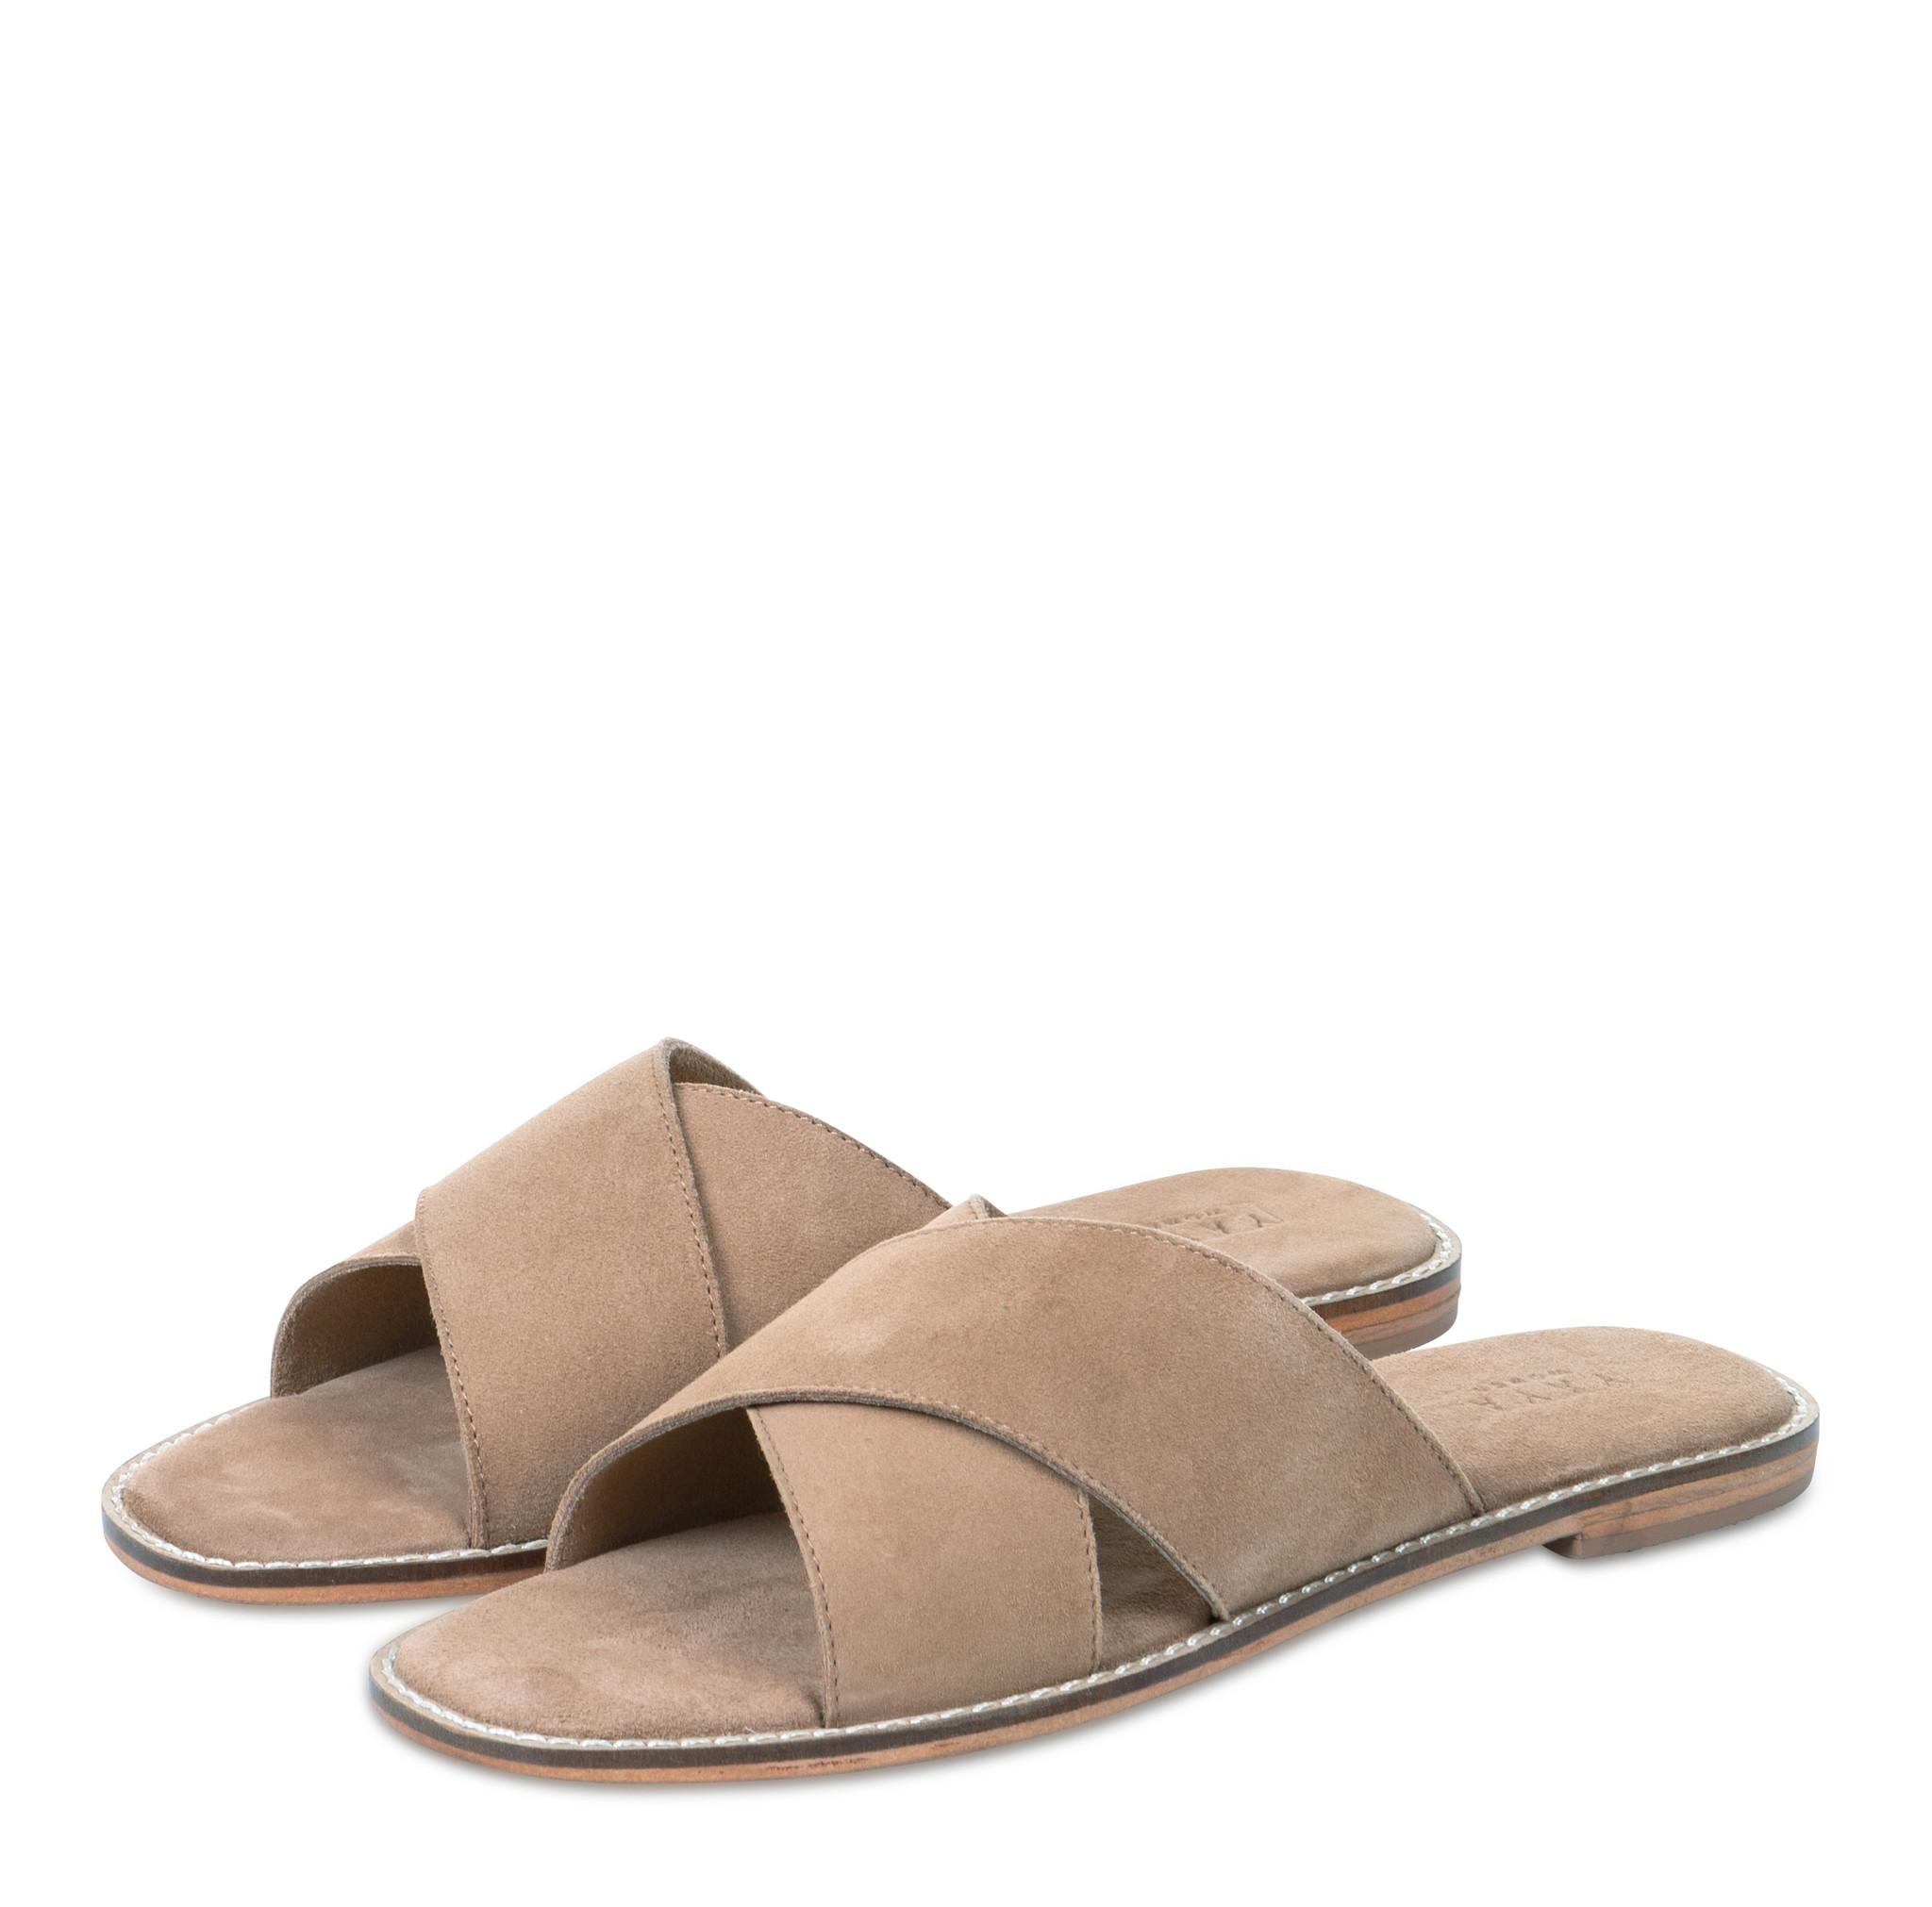 yaya Leather slipper with 134356-014-1